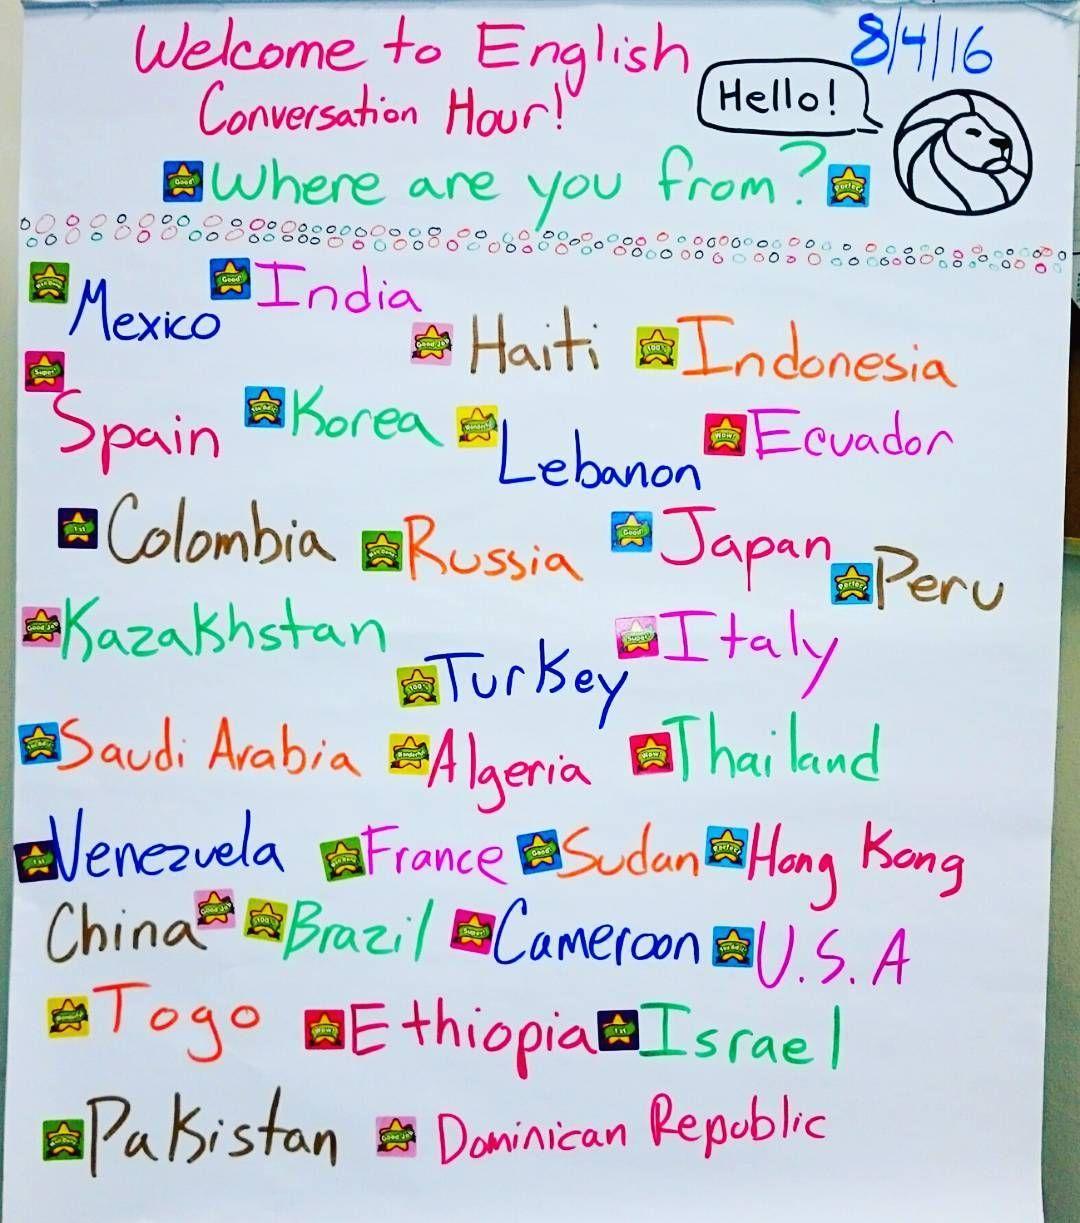 This Weeks Englishconversationhour Welcomed 108 Conversationalists